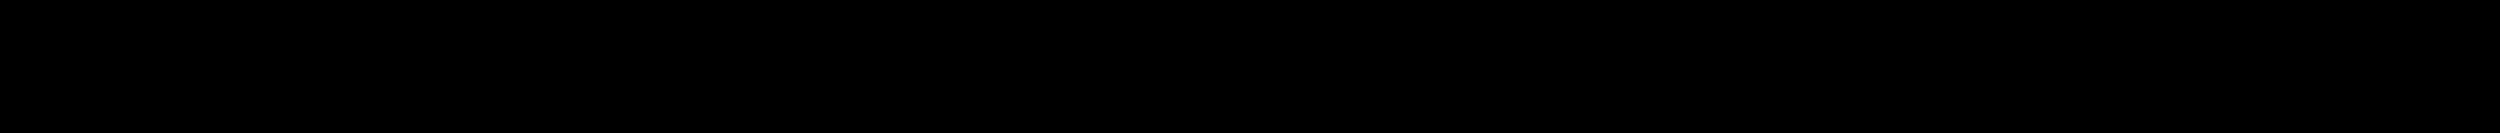 looper-subs-5.png